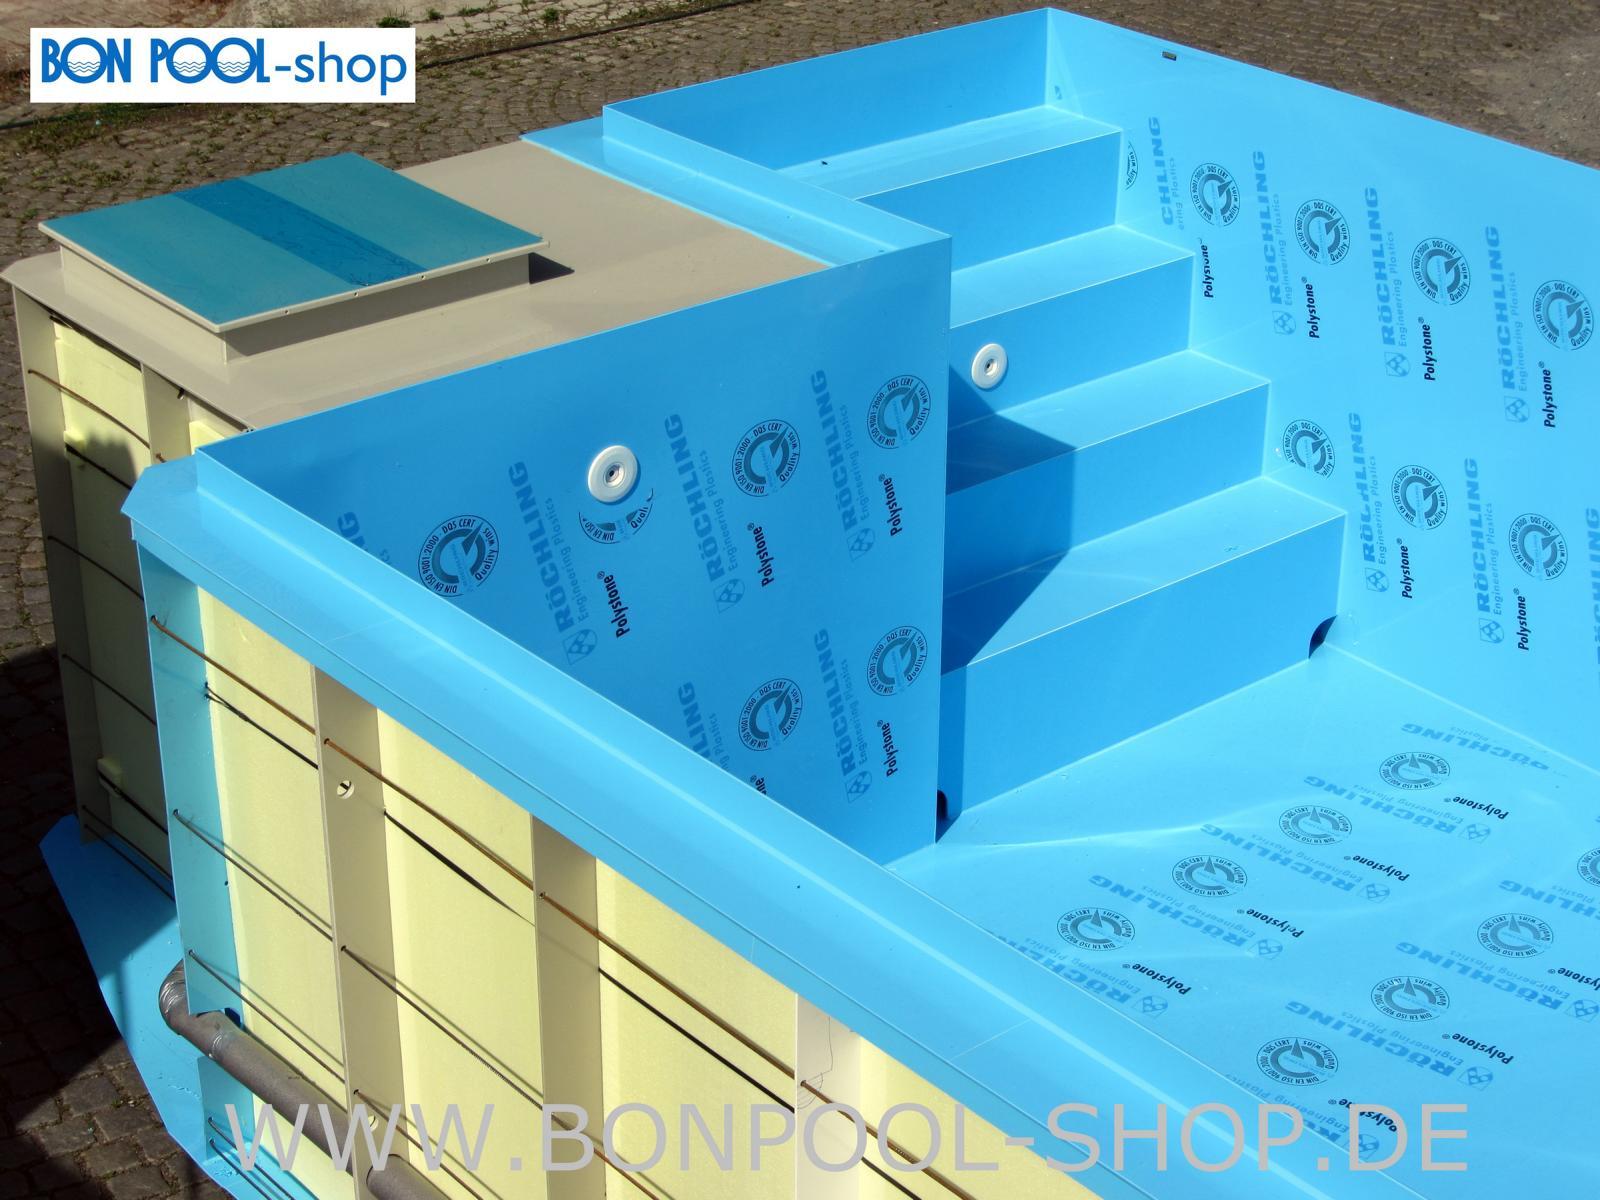 infinity pool set pp becken bon pool. Black Bedroom Furniture Sets. Home Design Ideas